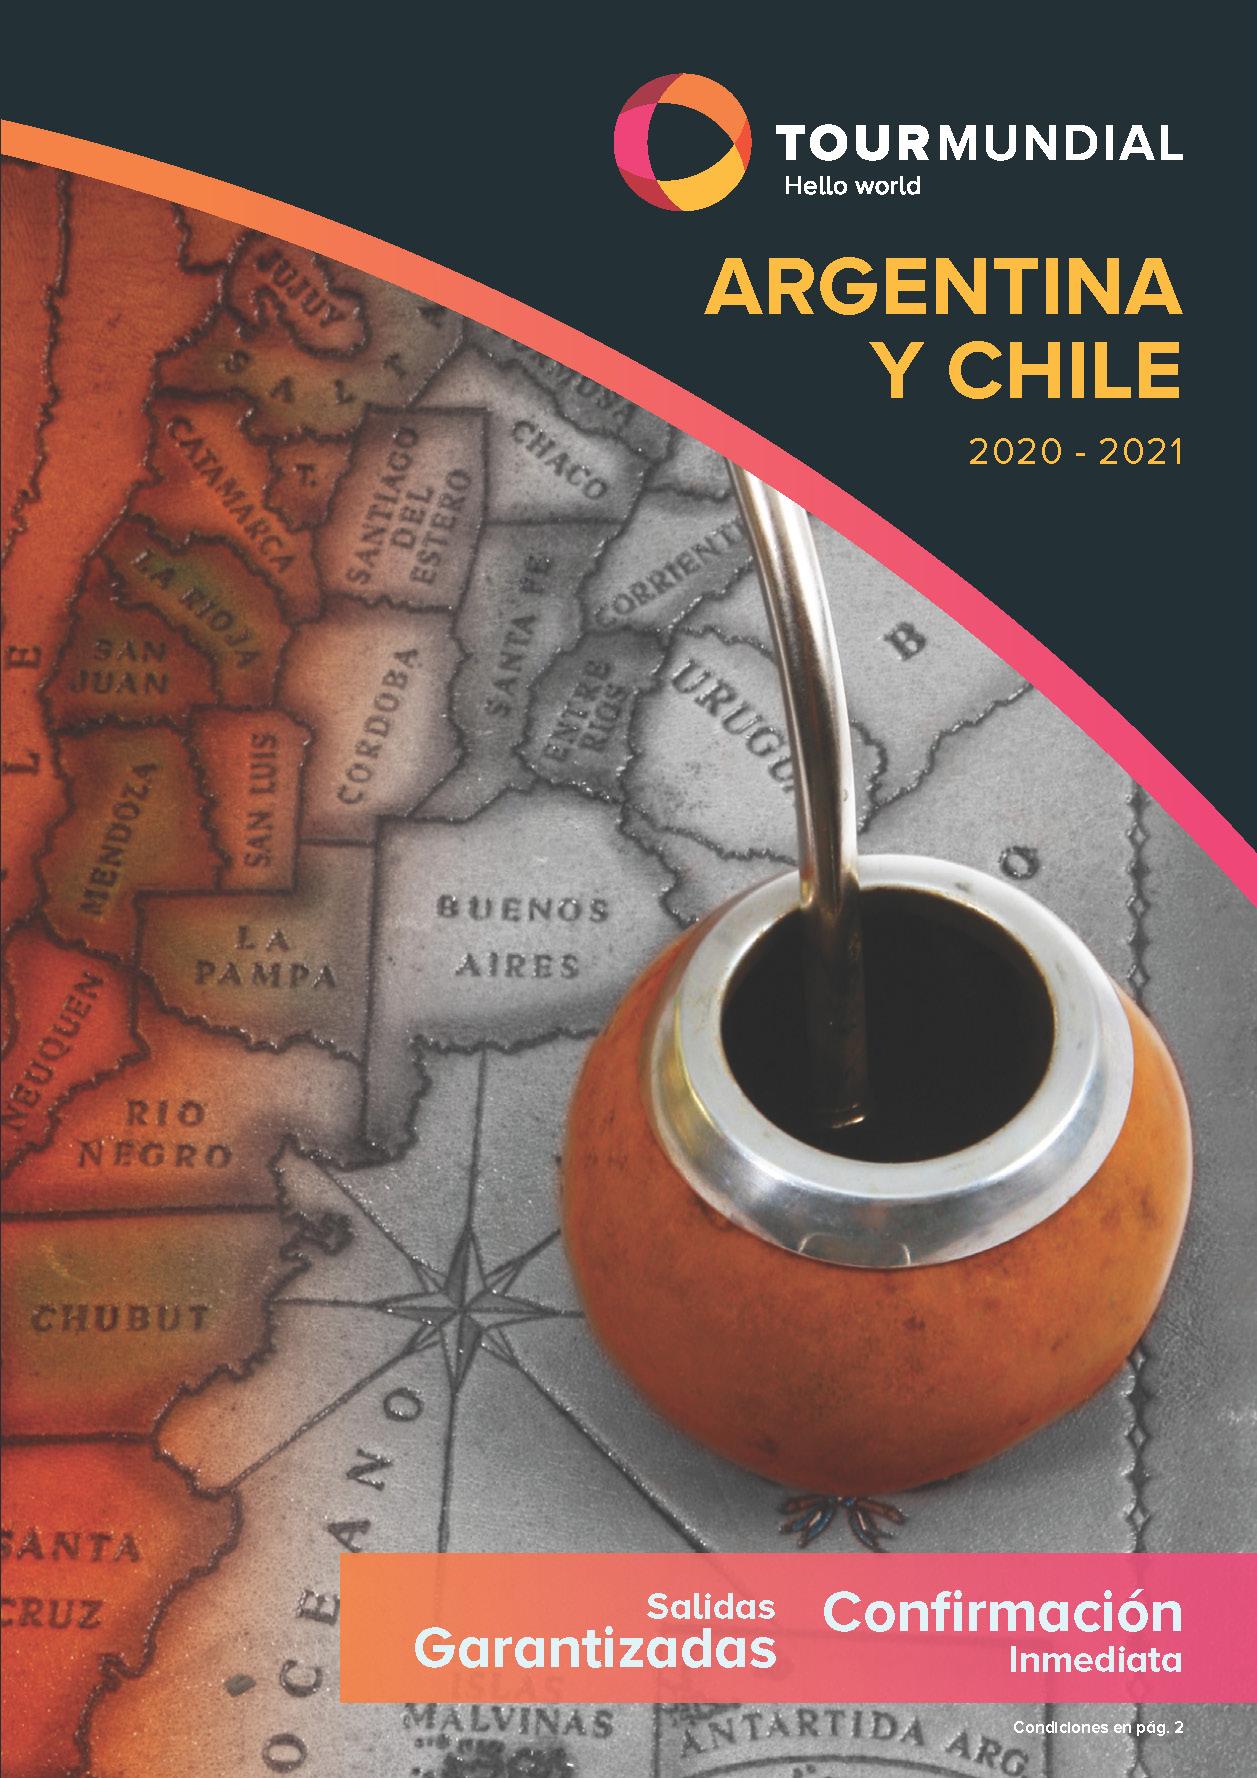 Catalogo Tourmundial Argentina y Chile 2020-2021